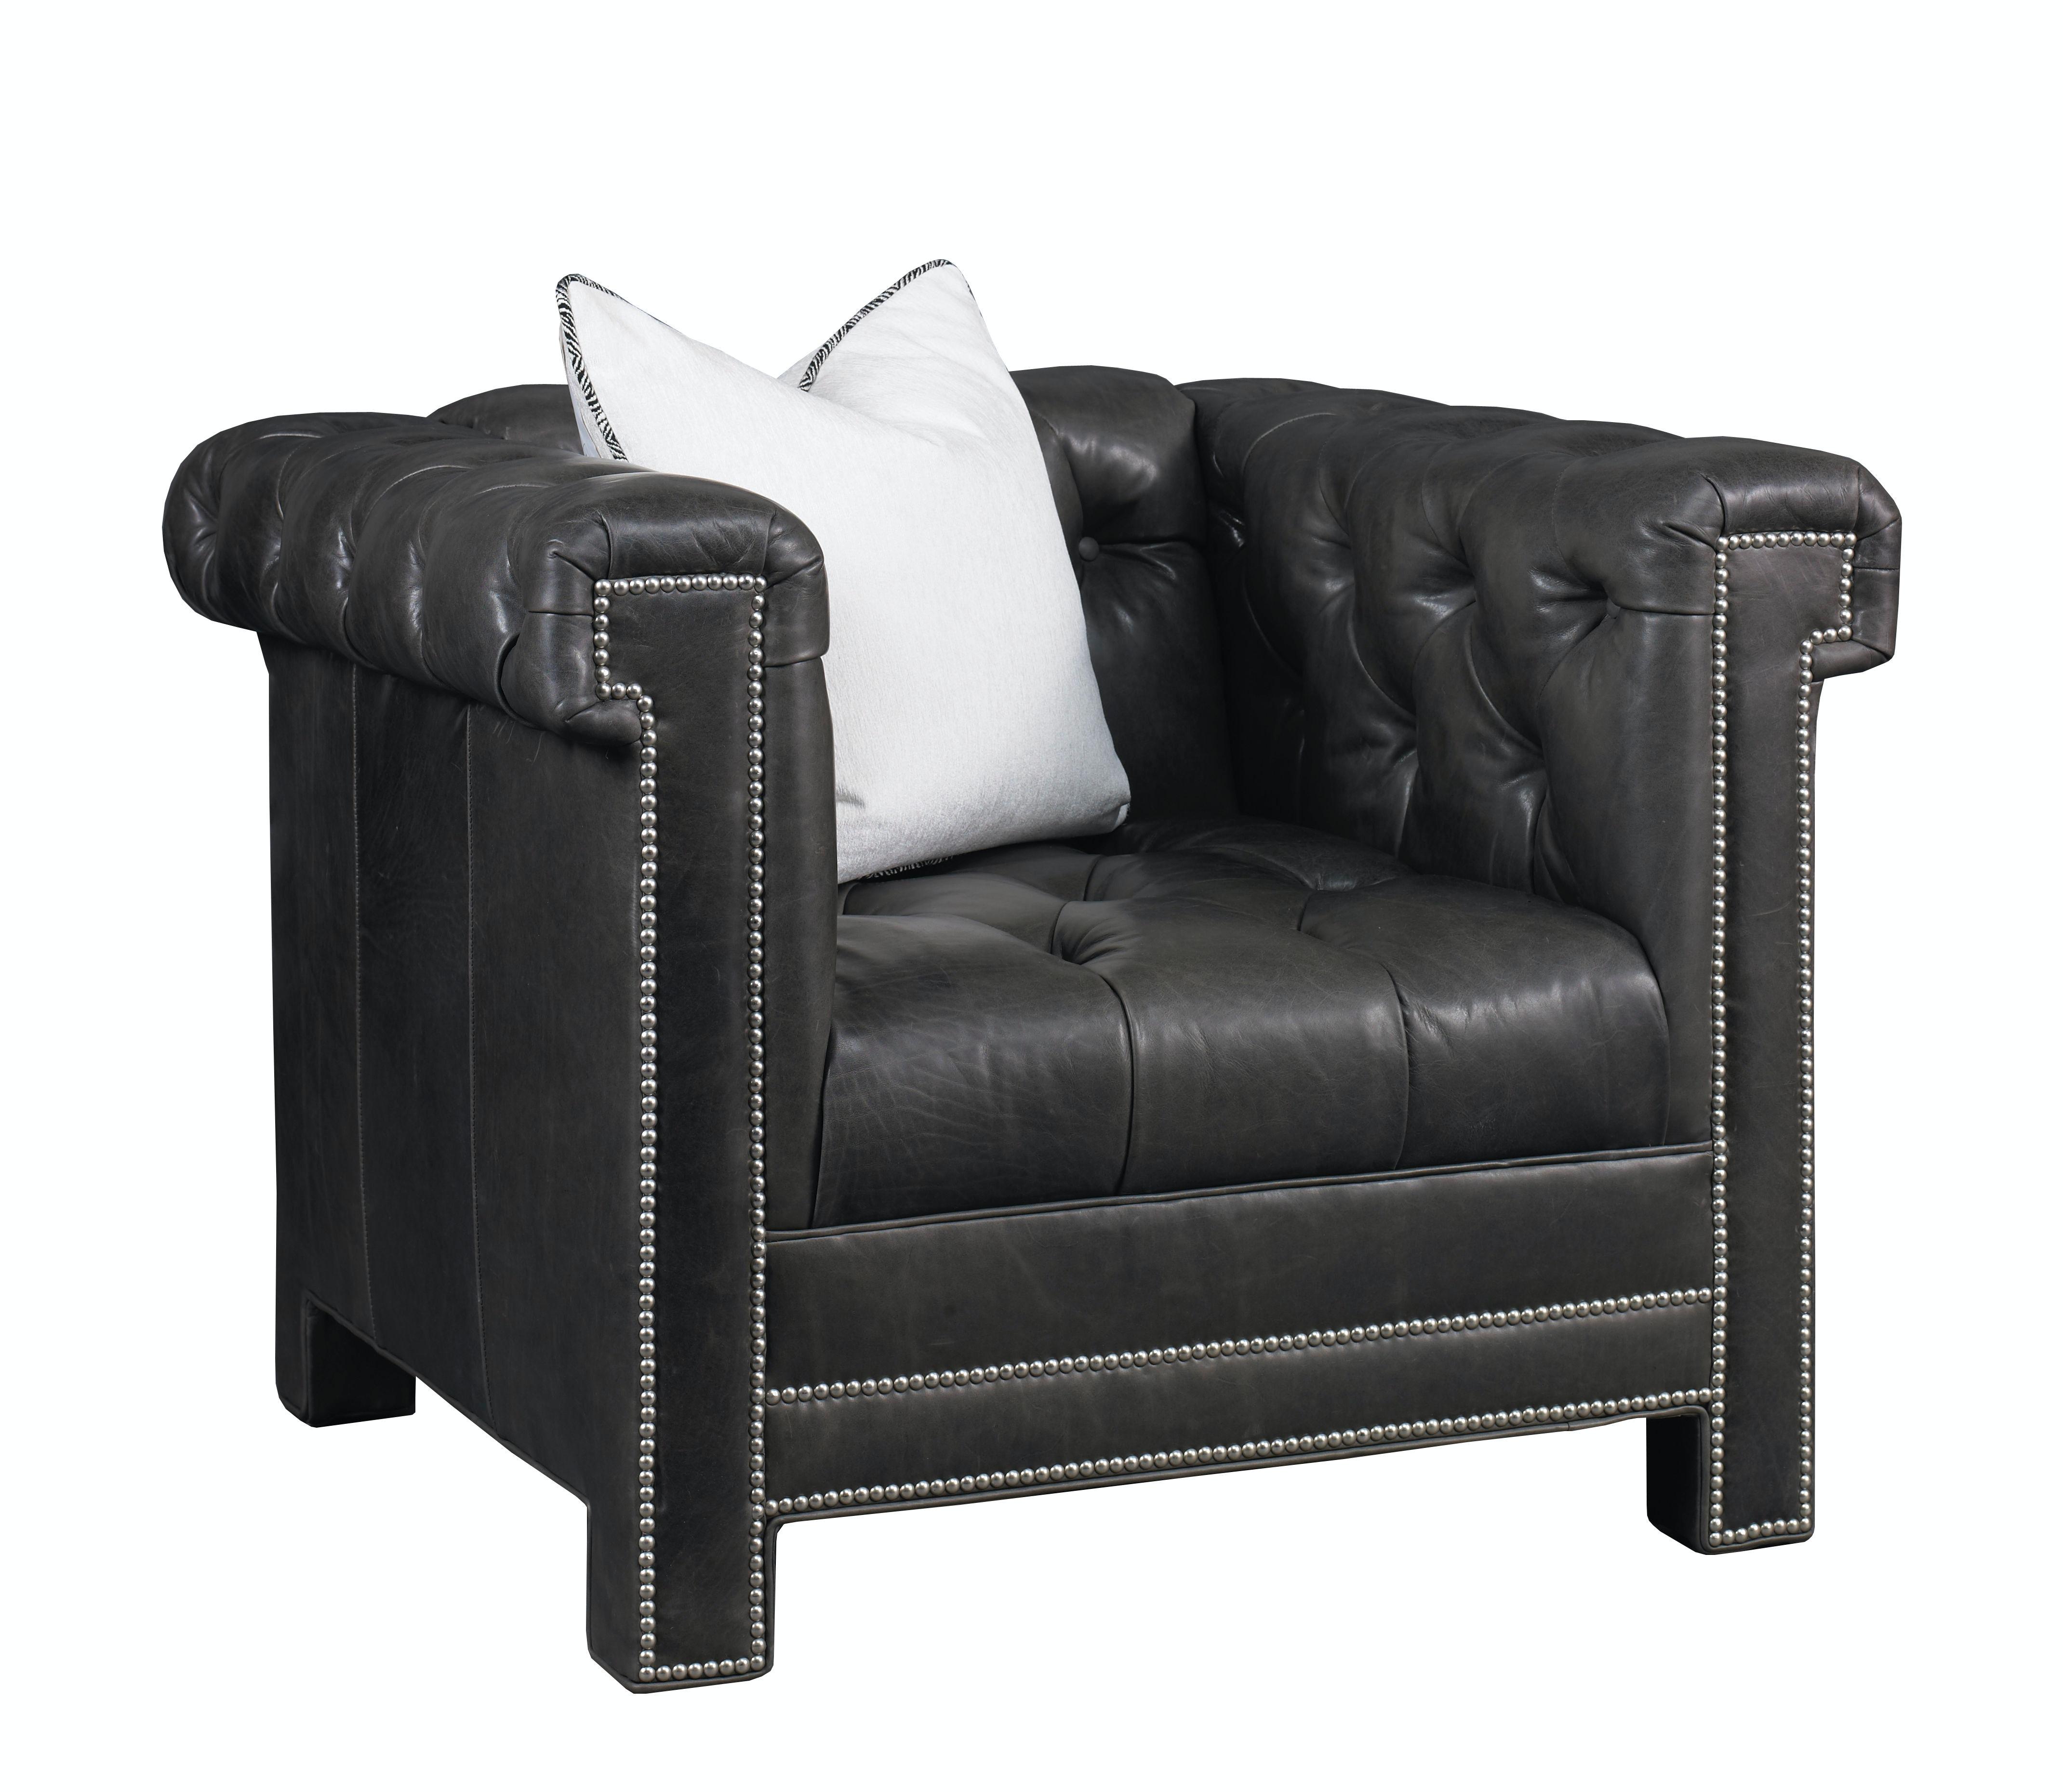 Lillian August For Hickory White Tyler Chair LL7150C